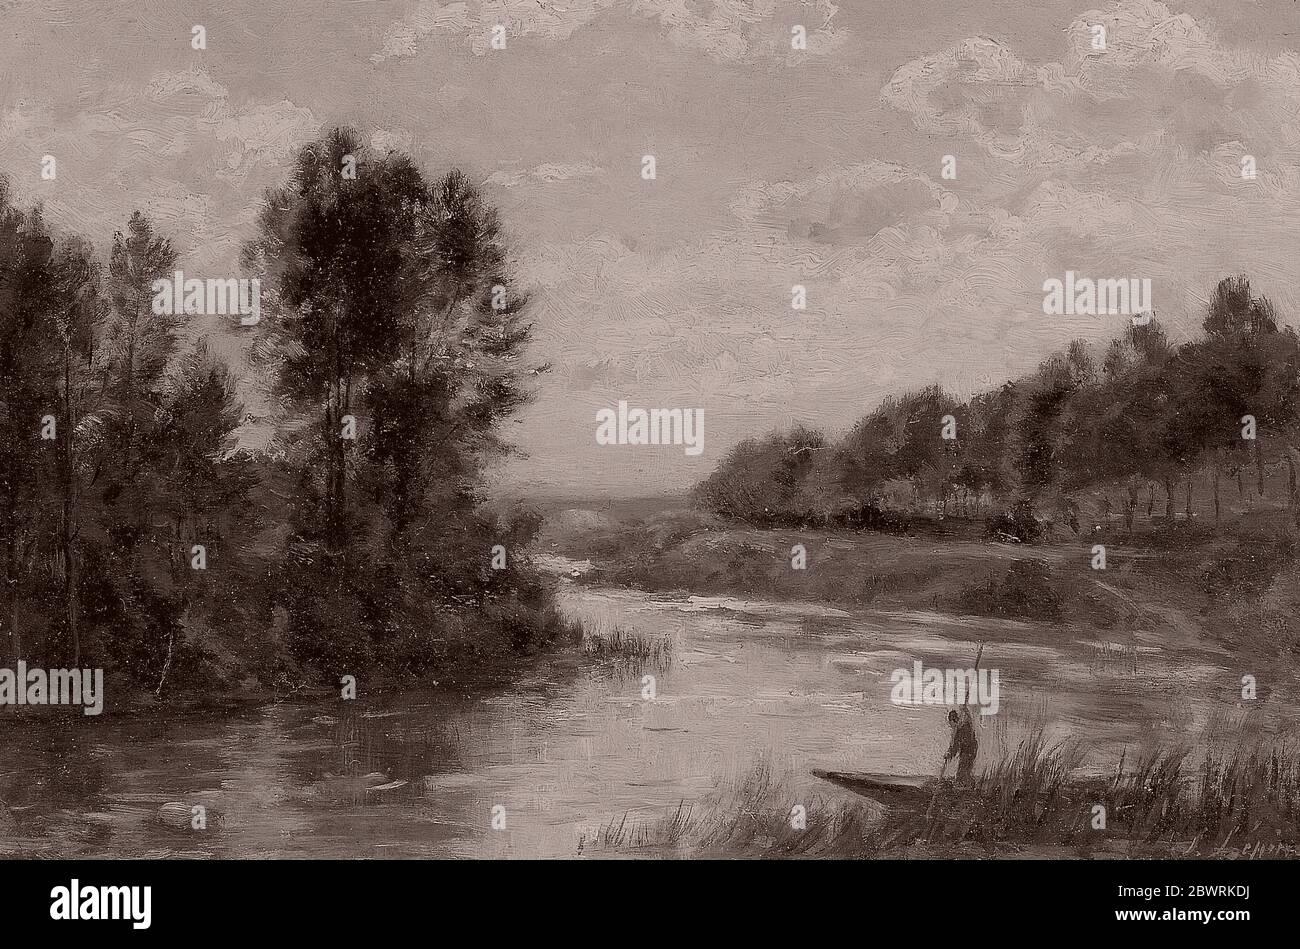 Author: Stanislas Lpine. A Stream in France - c. 1880 - Stanislas Lpine French, 1835-1892. Oil on panel. 1875'1885. Stock Photo